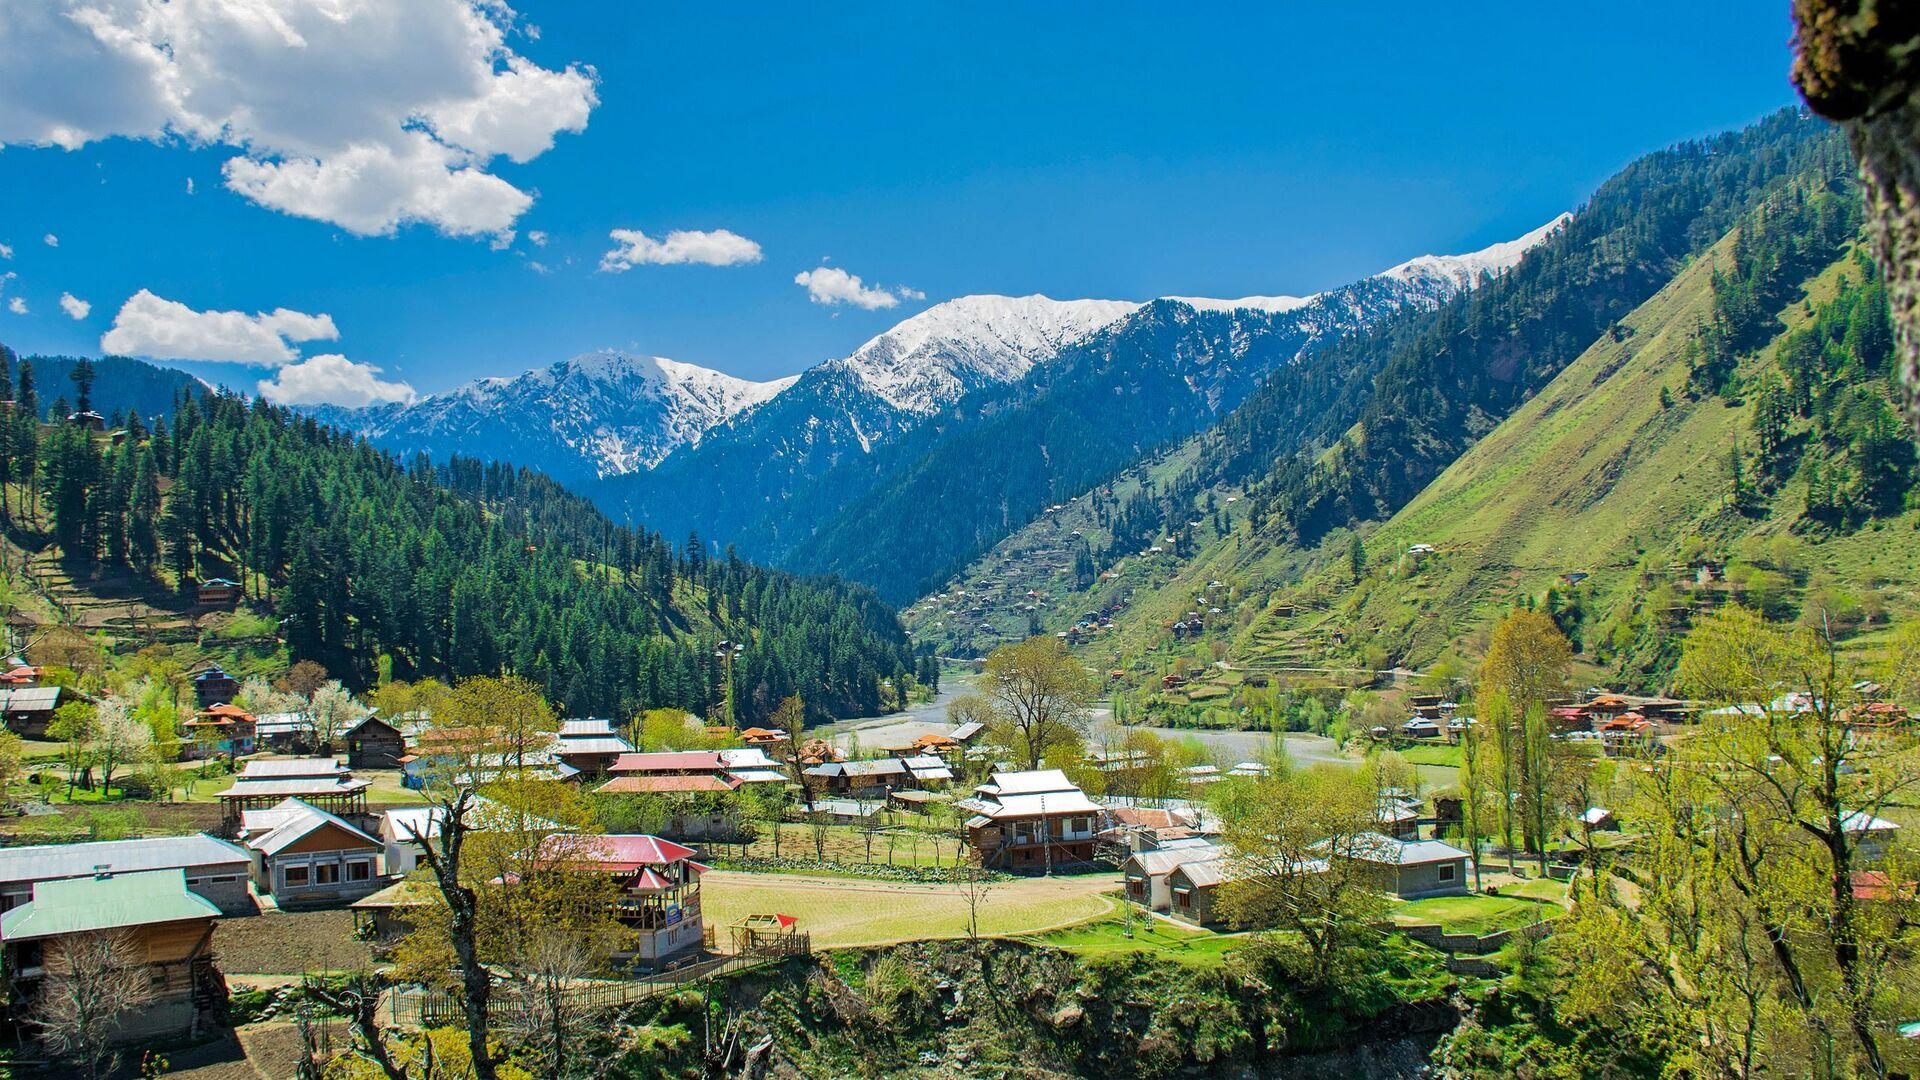 View From Sharda Fort, Azad Jammu & Kashmir, Pakistan - Sputnik International, 1920, 30.07.2021